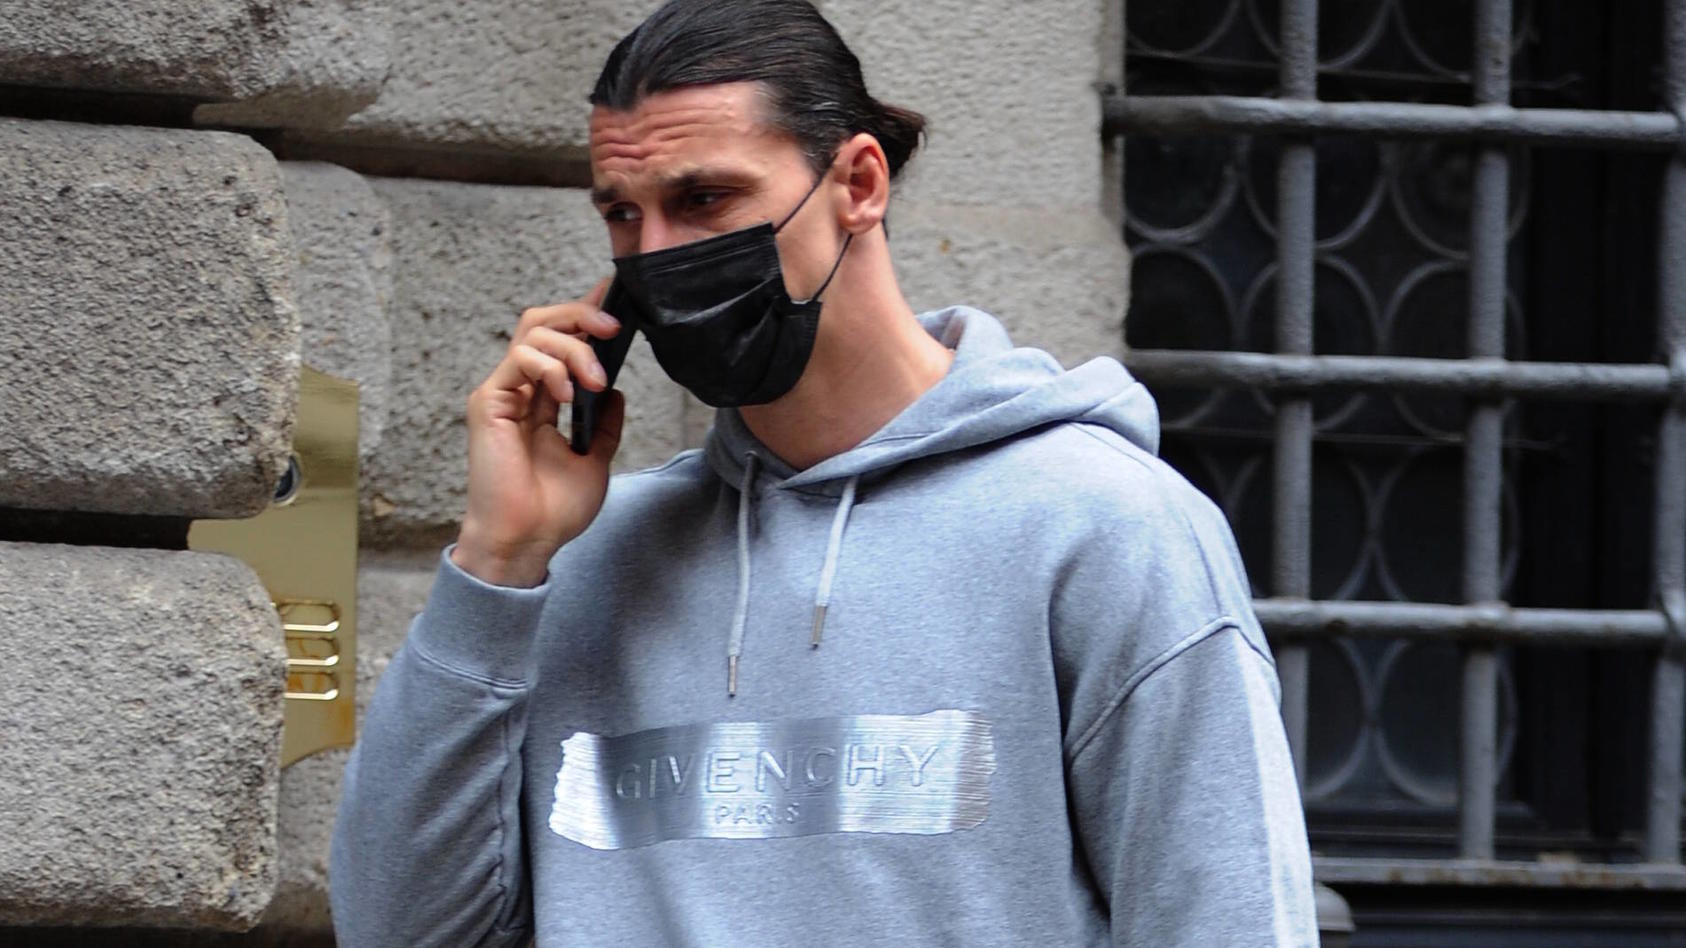 Zlatan Ibrahimovic kann wegen einer Knieverletzung nicht an der EM teilnehmen.